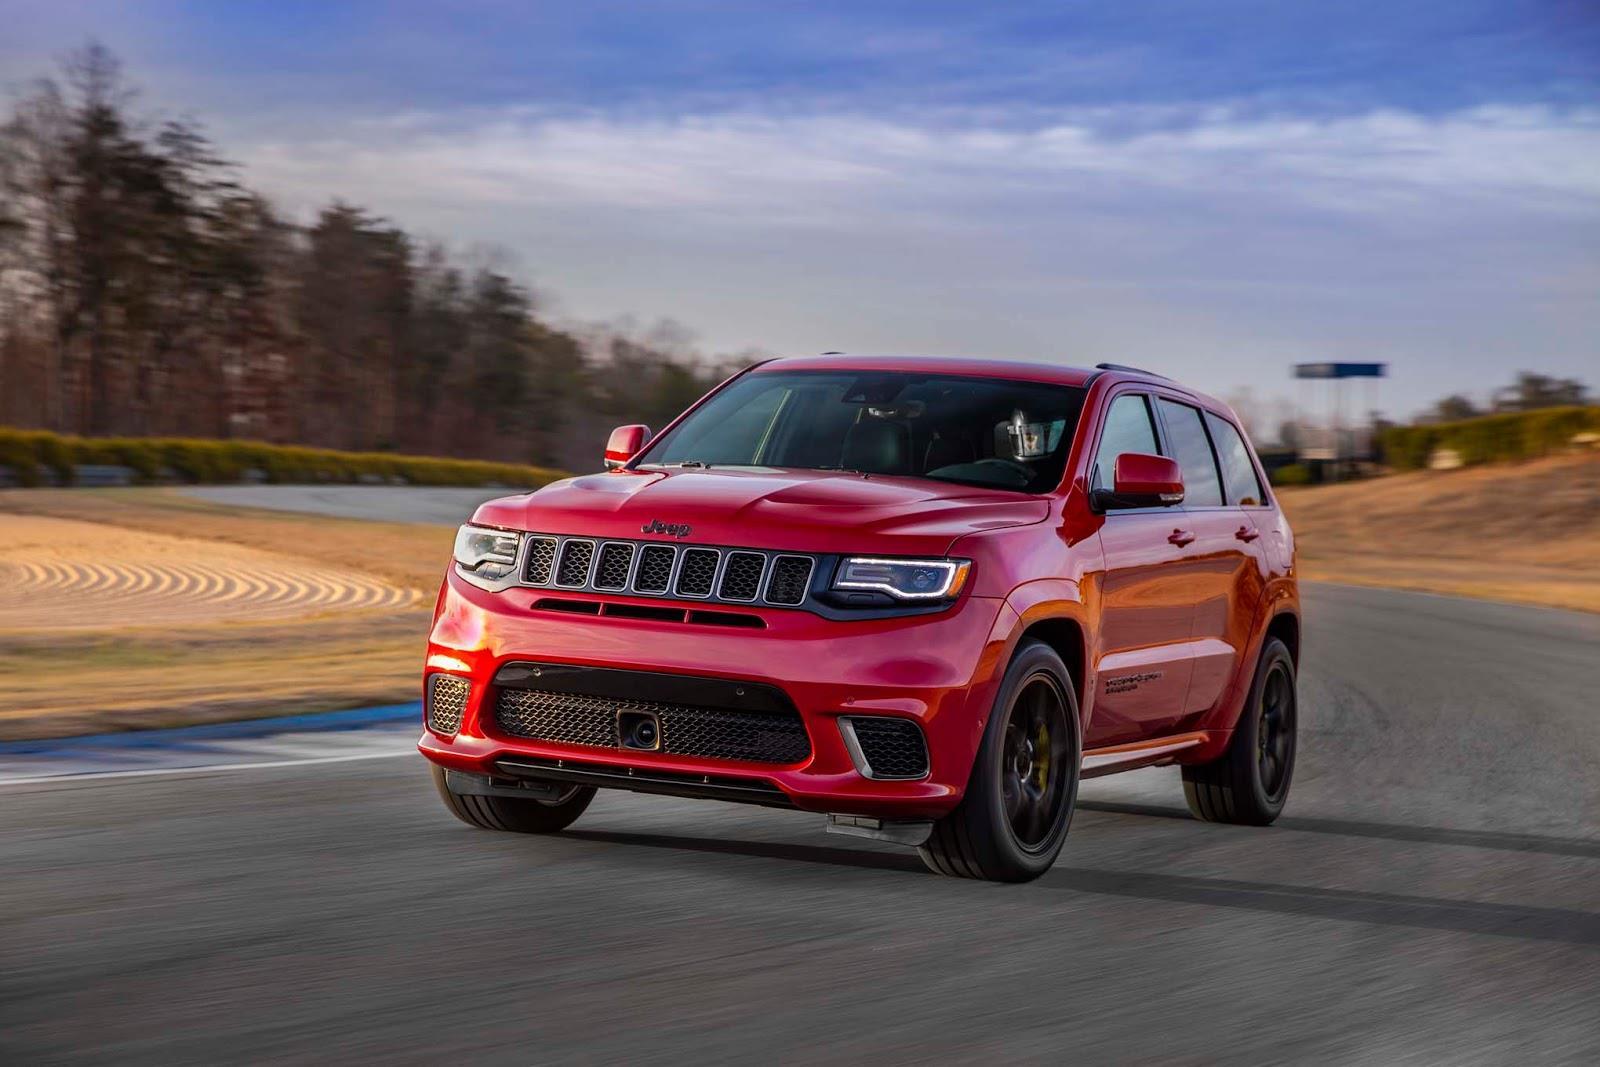 2018 Jeep Grand Cherokee Trackhawk image gallery